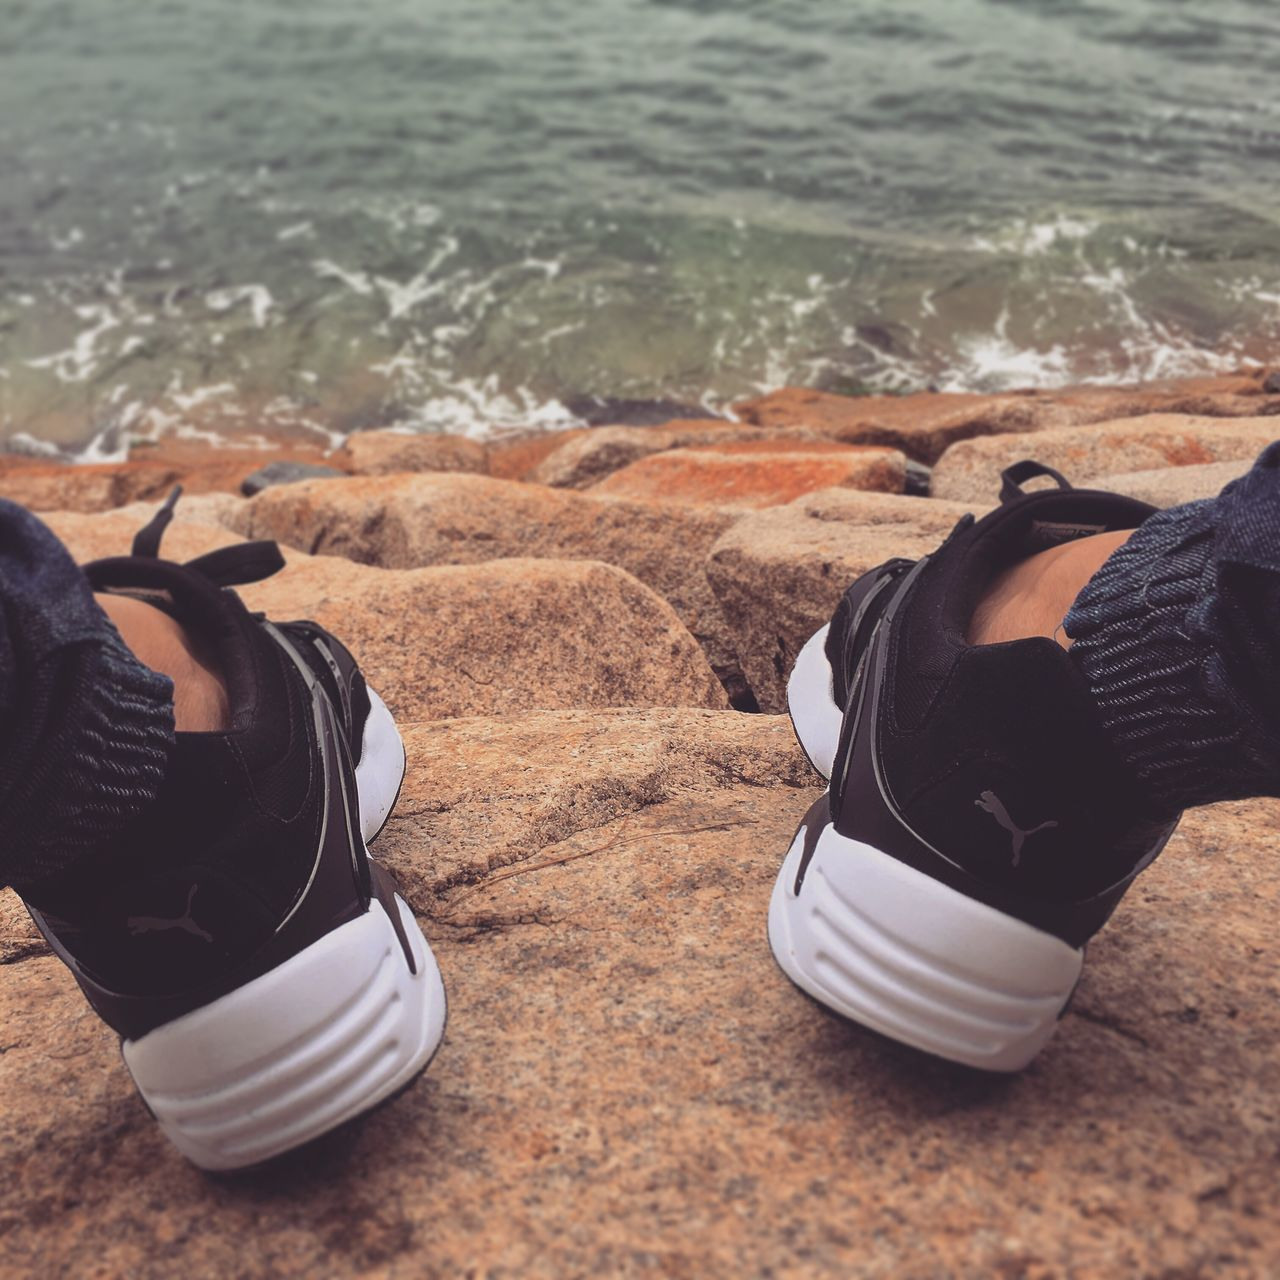 Beautiful stock photos of puma, shoe, low section, sand, human leg